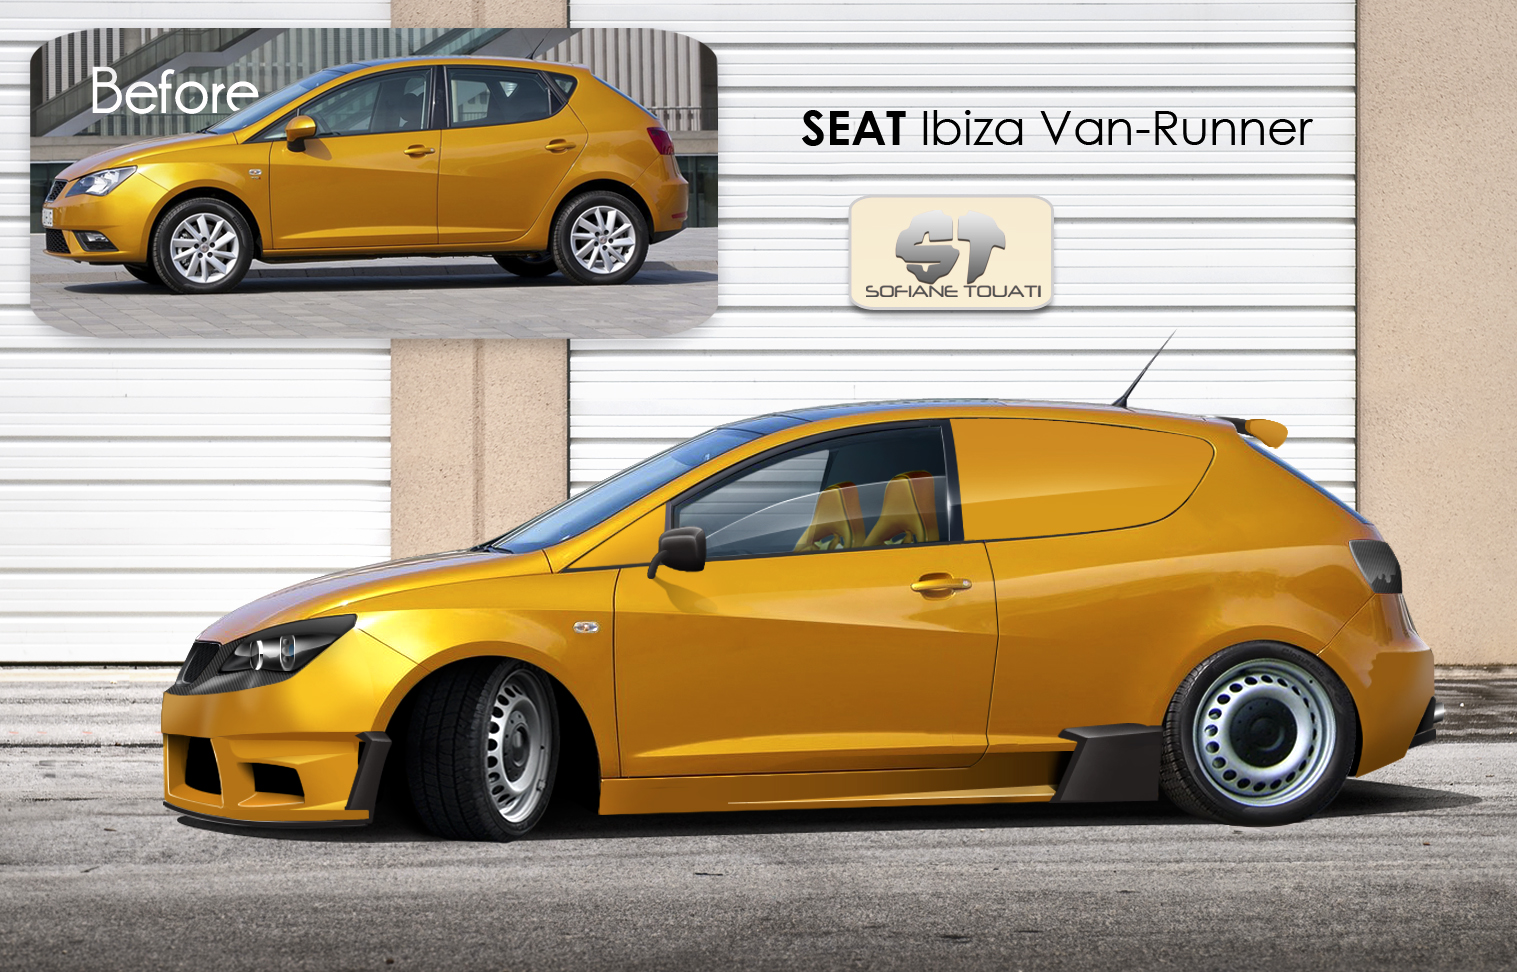 seat ibiza van runner virtual tuning by sofianetouati on. Black Bedroom Furniture Sets. Home Design Ideas